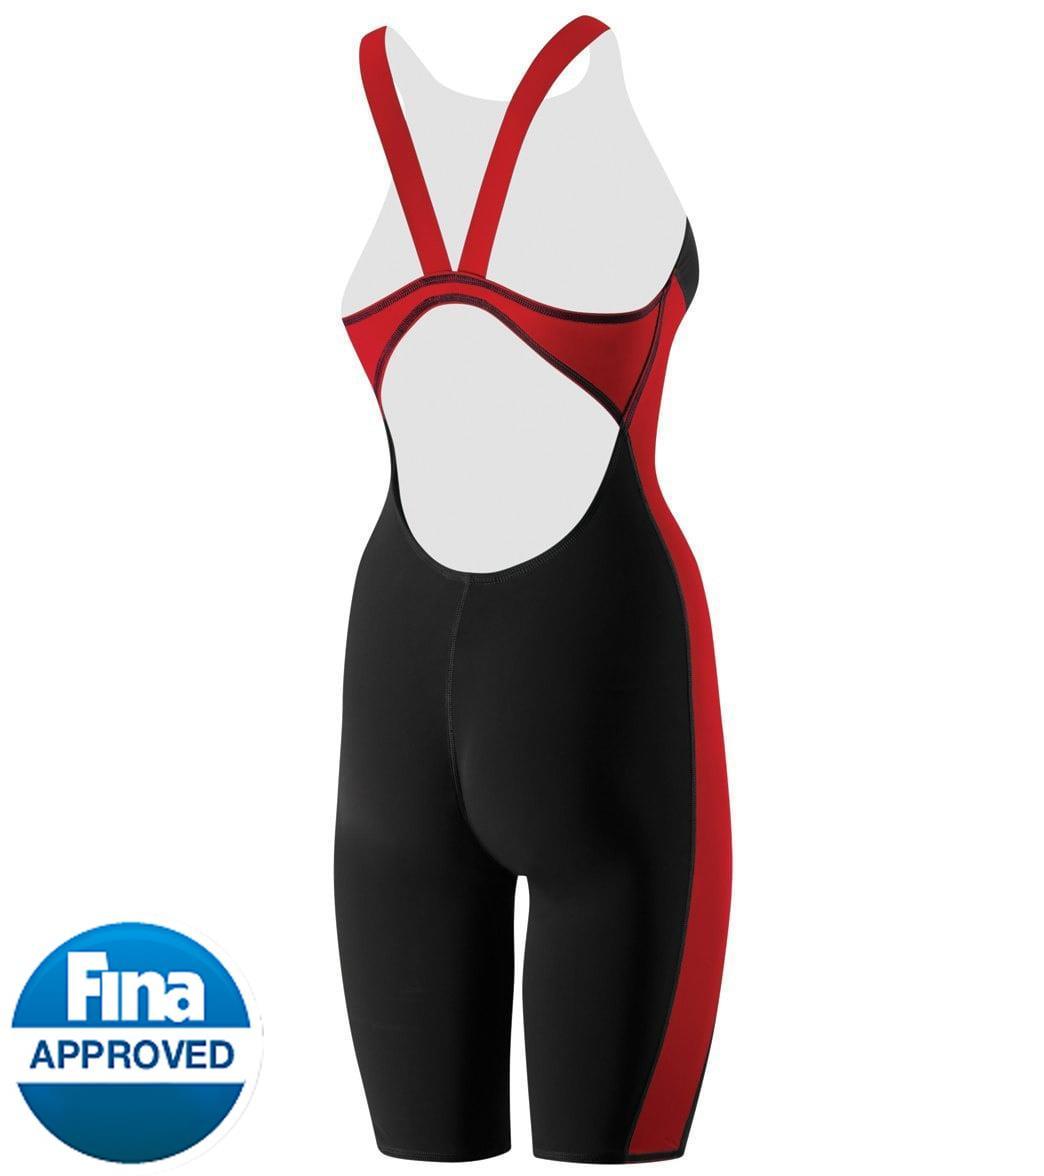 9d1661832fea2 Speedo Powerplus Youth Kneeskin Tech Suit Swimsuit at SwimOutlet.com - Free  Shipping